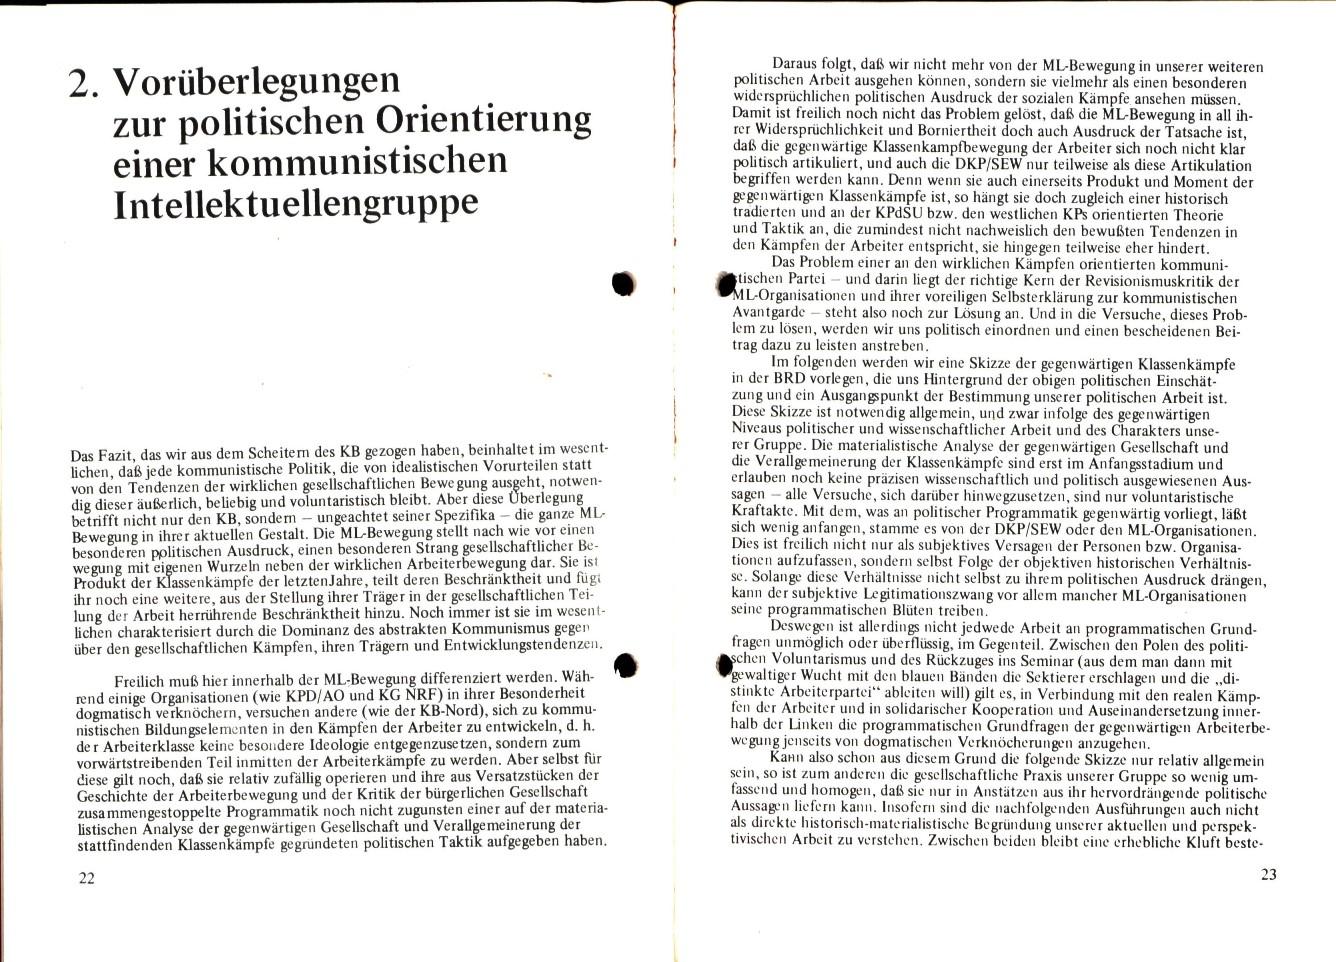 Berlin_KBML_Kommunist_1973_04s_13